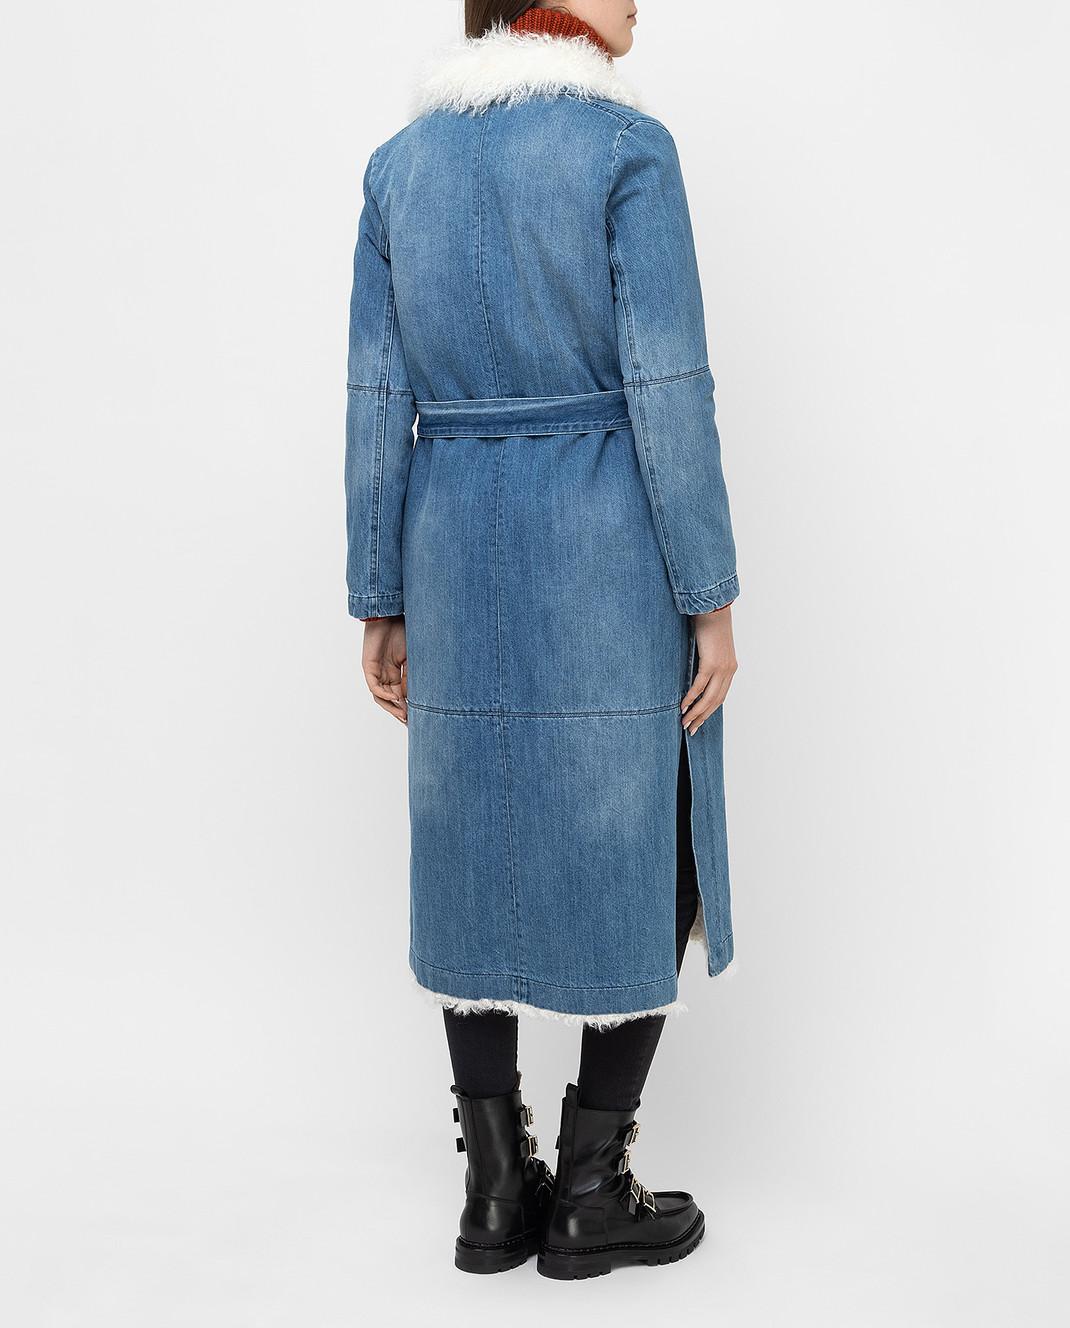 Simonetta Ravizza Синее джинсовое пальто VASIA3 изображение 4